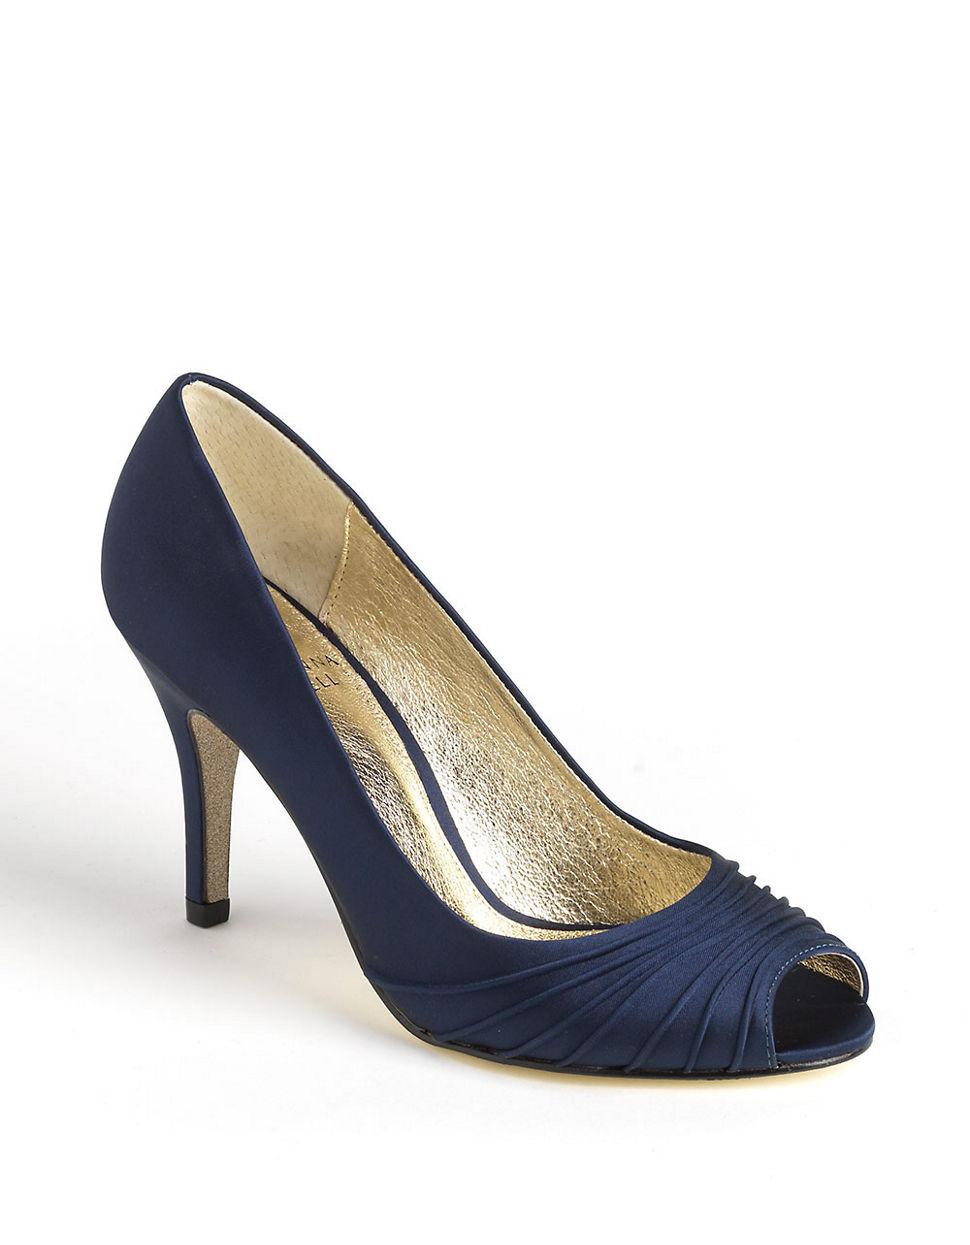 Navy Blue Pumps Shoes Womens Designer